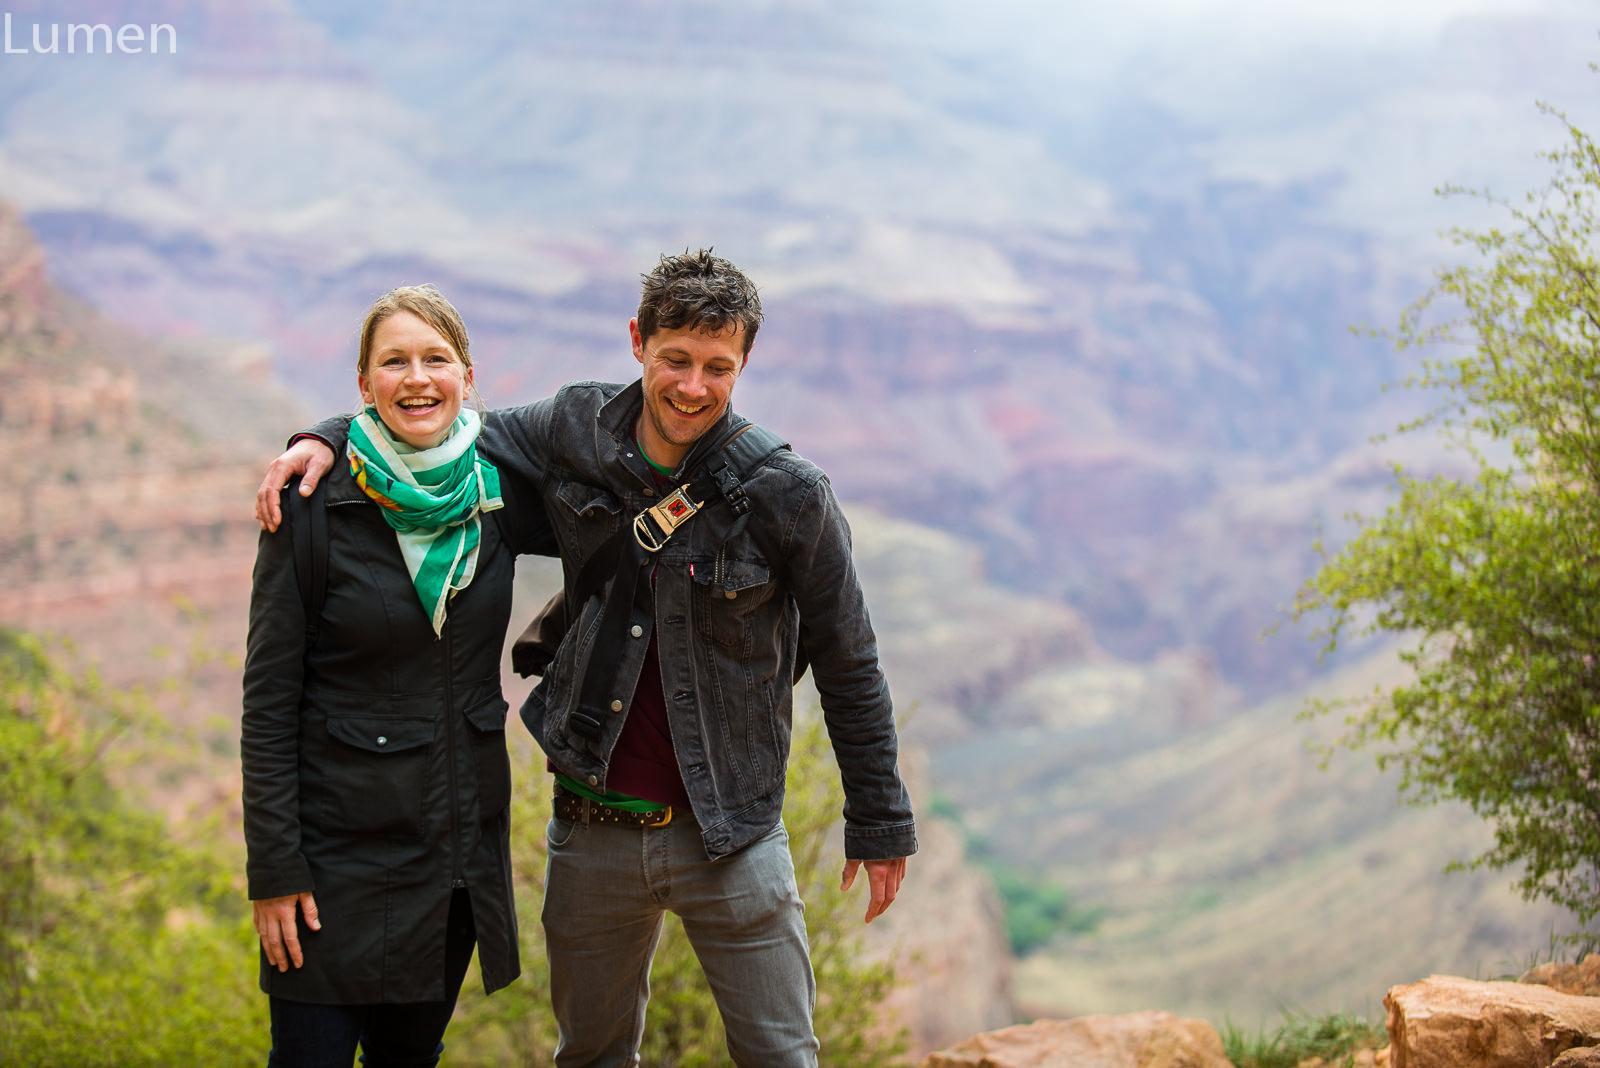 lumen photography, adventurous photos, couture, minnesota, arizona, grand canyon, personal, kelsey, evan, arizona travel photography